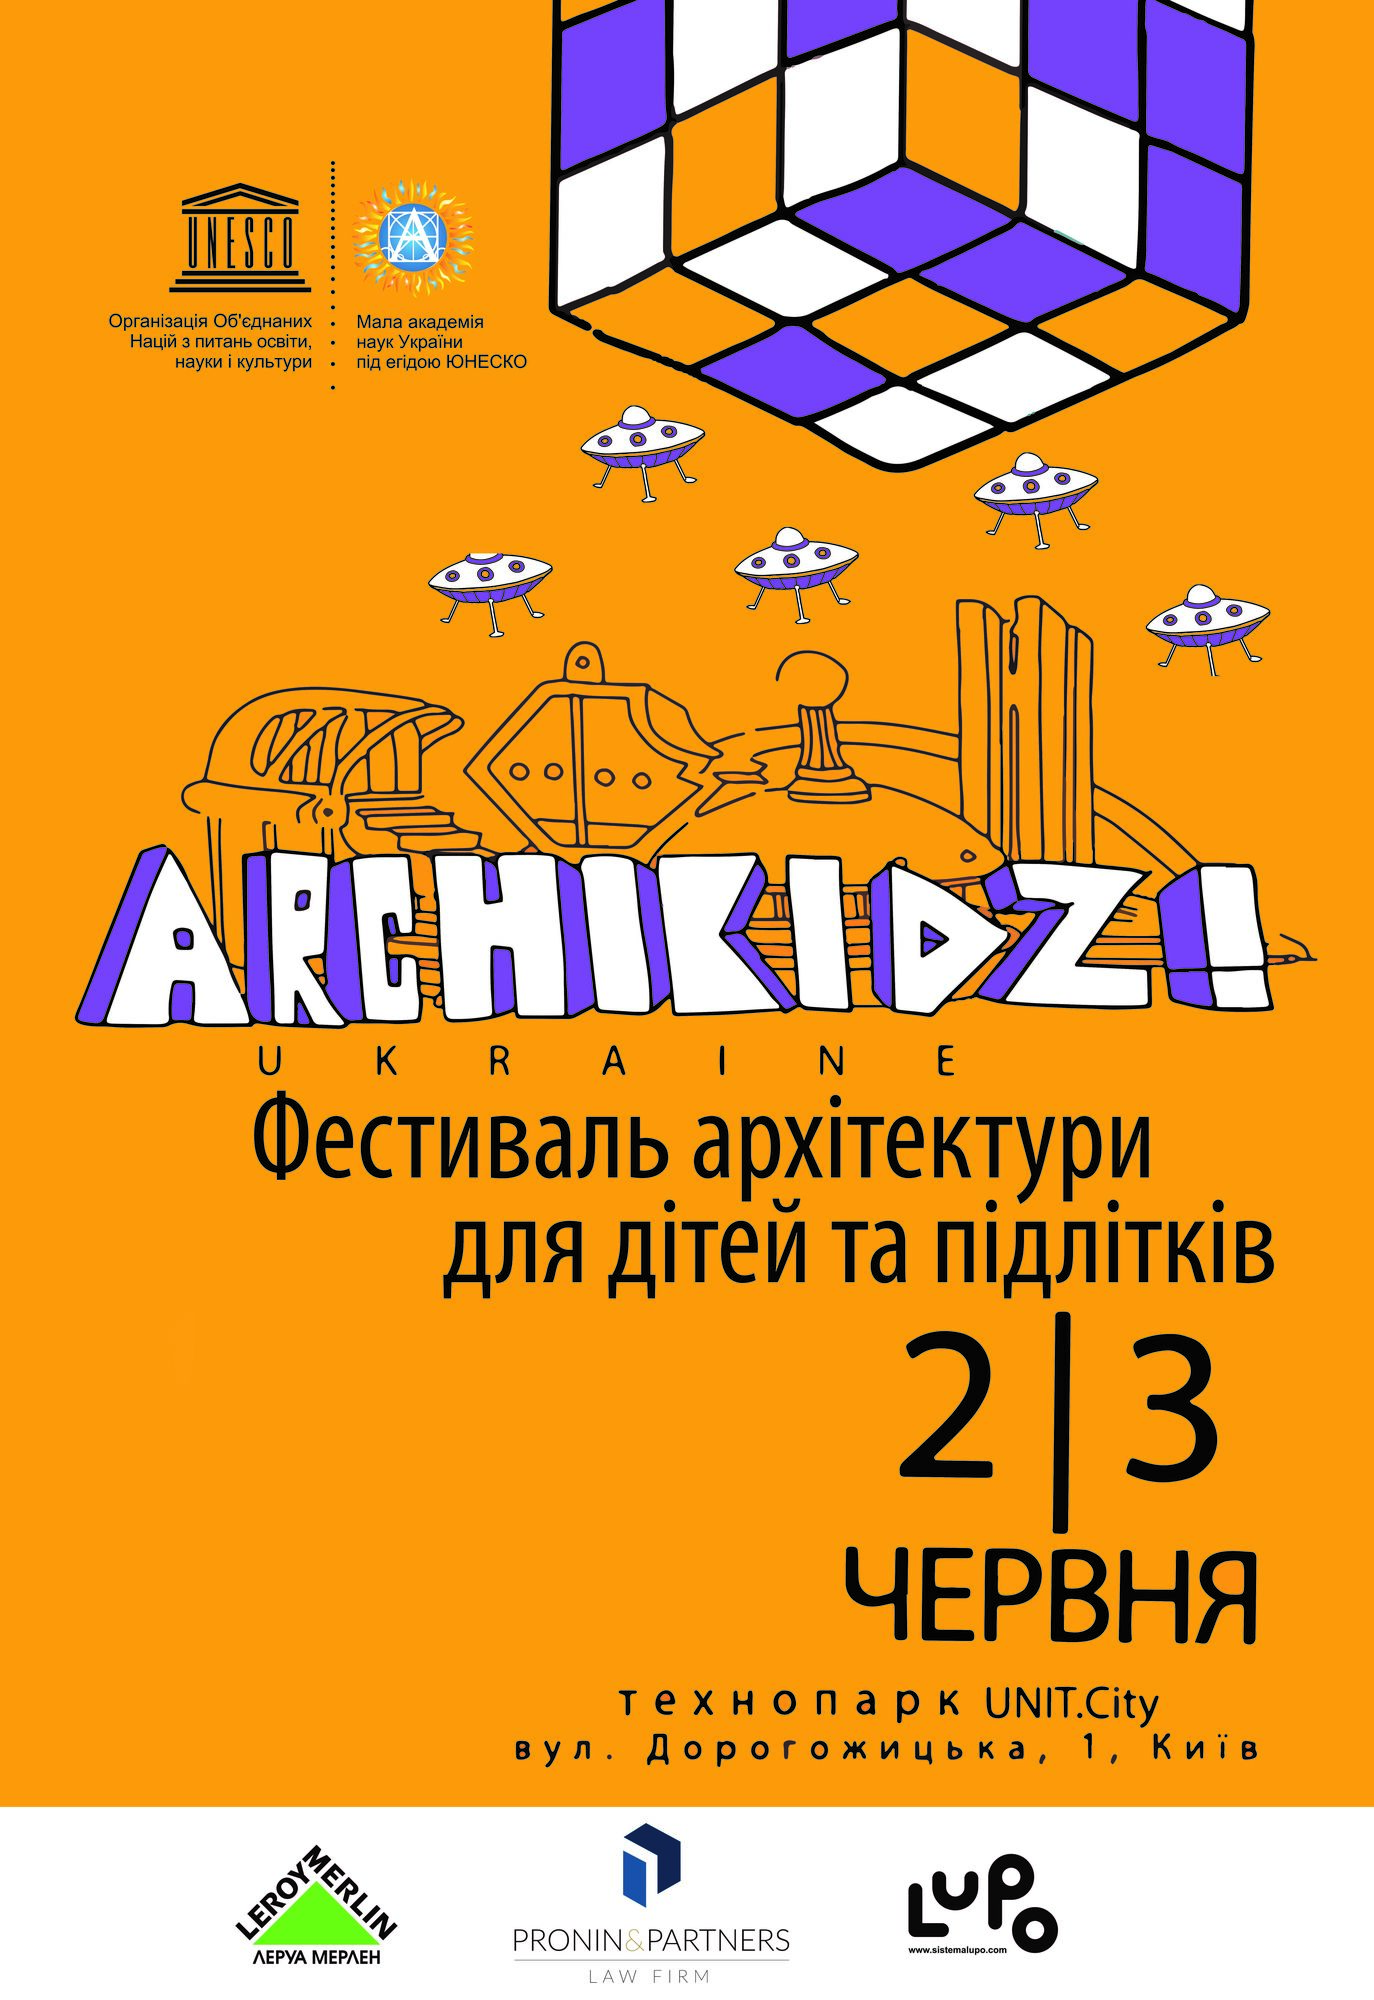 Фестиваль Archikidz!, 2-3.06, 1.07